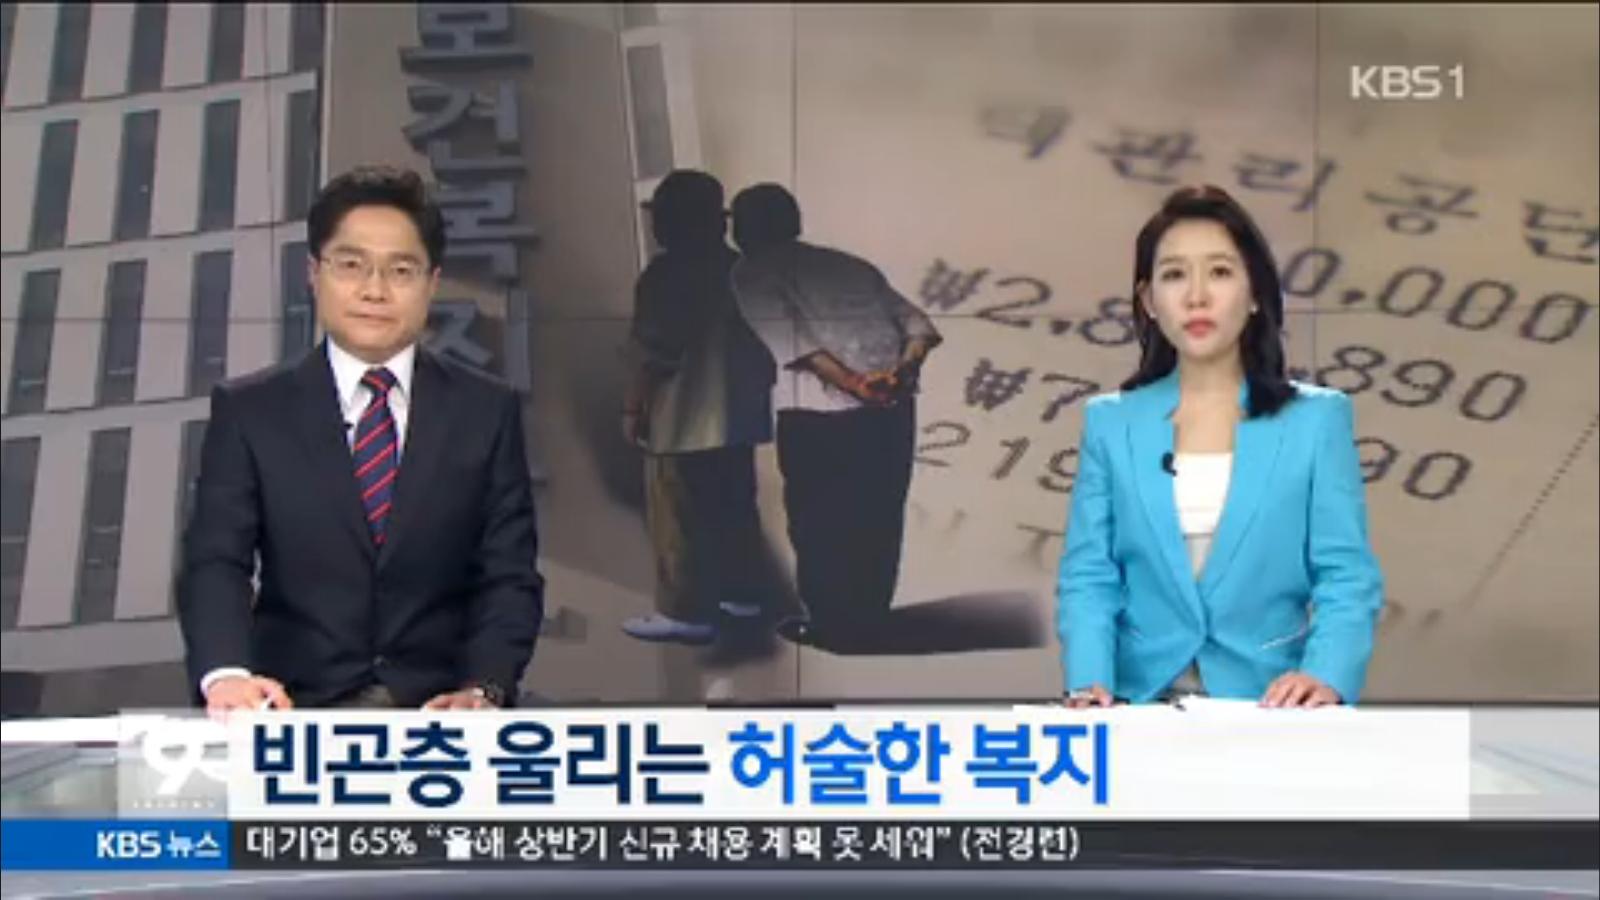 [15.3.2 KBS전주] 전주시, 빈곤층 울리는 허술한 복지행정1.jpg